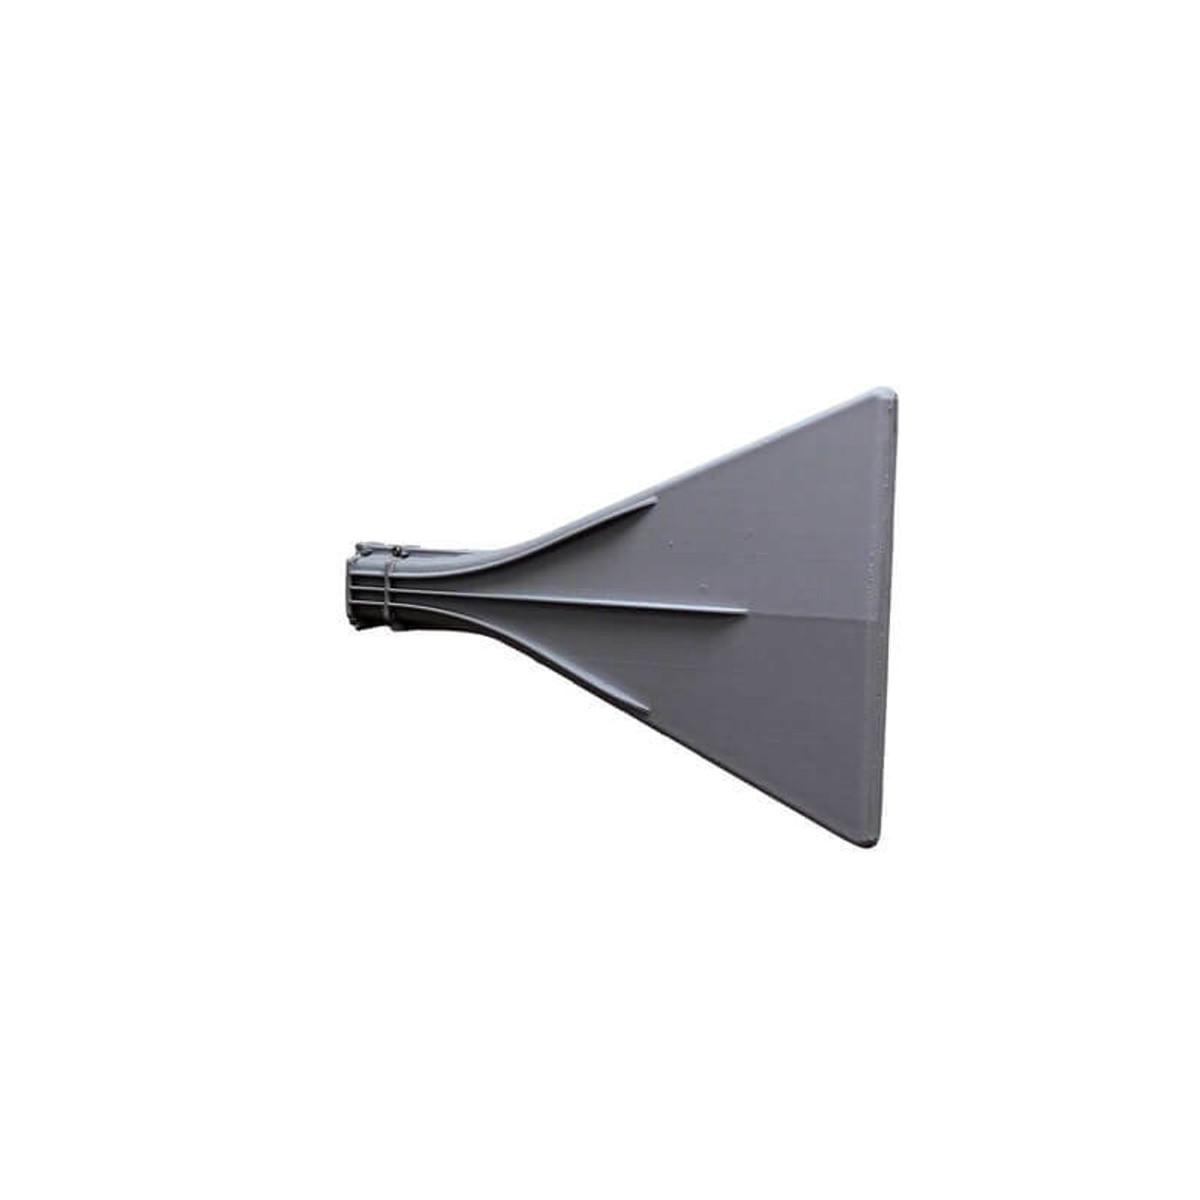 Bolton Technical UltraGain 26 Directional Antenna